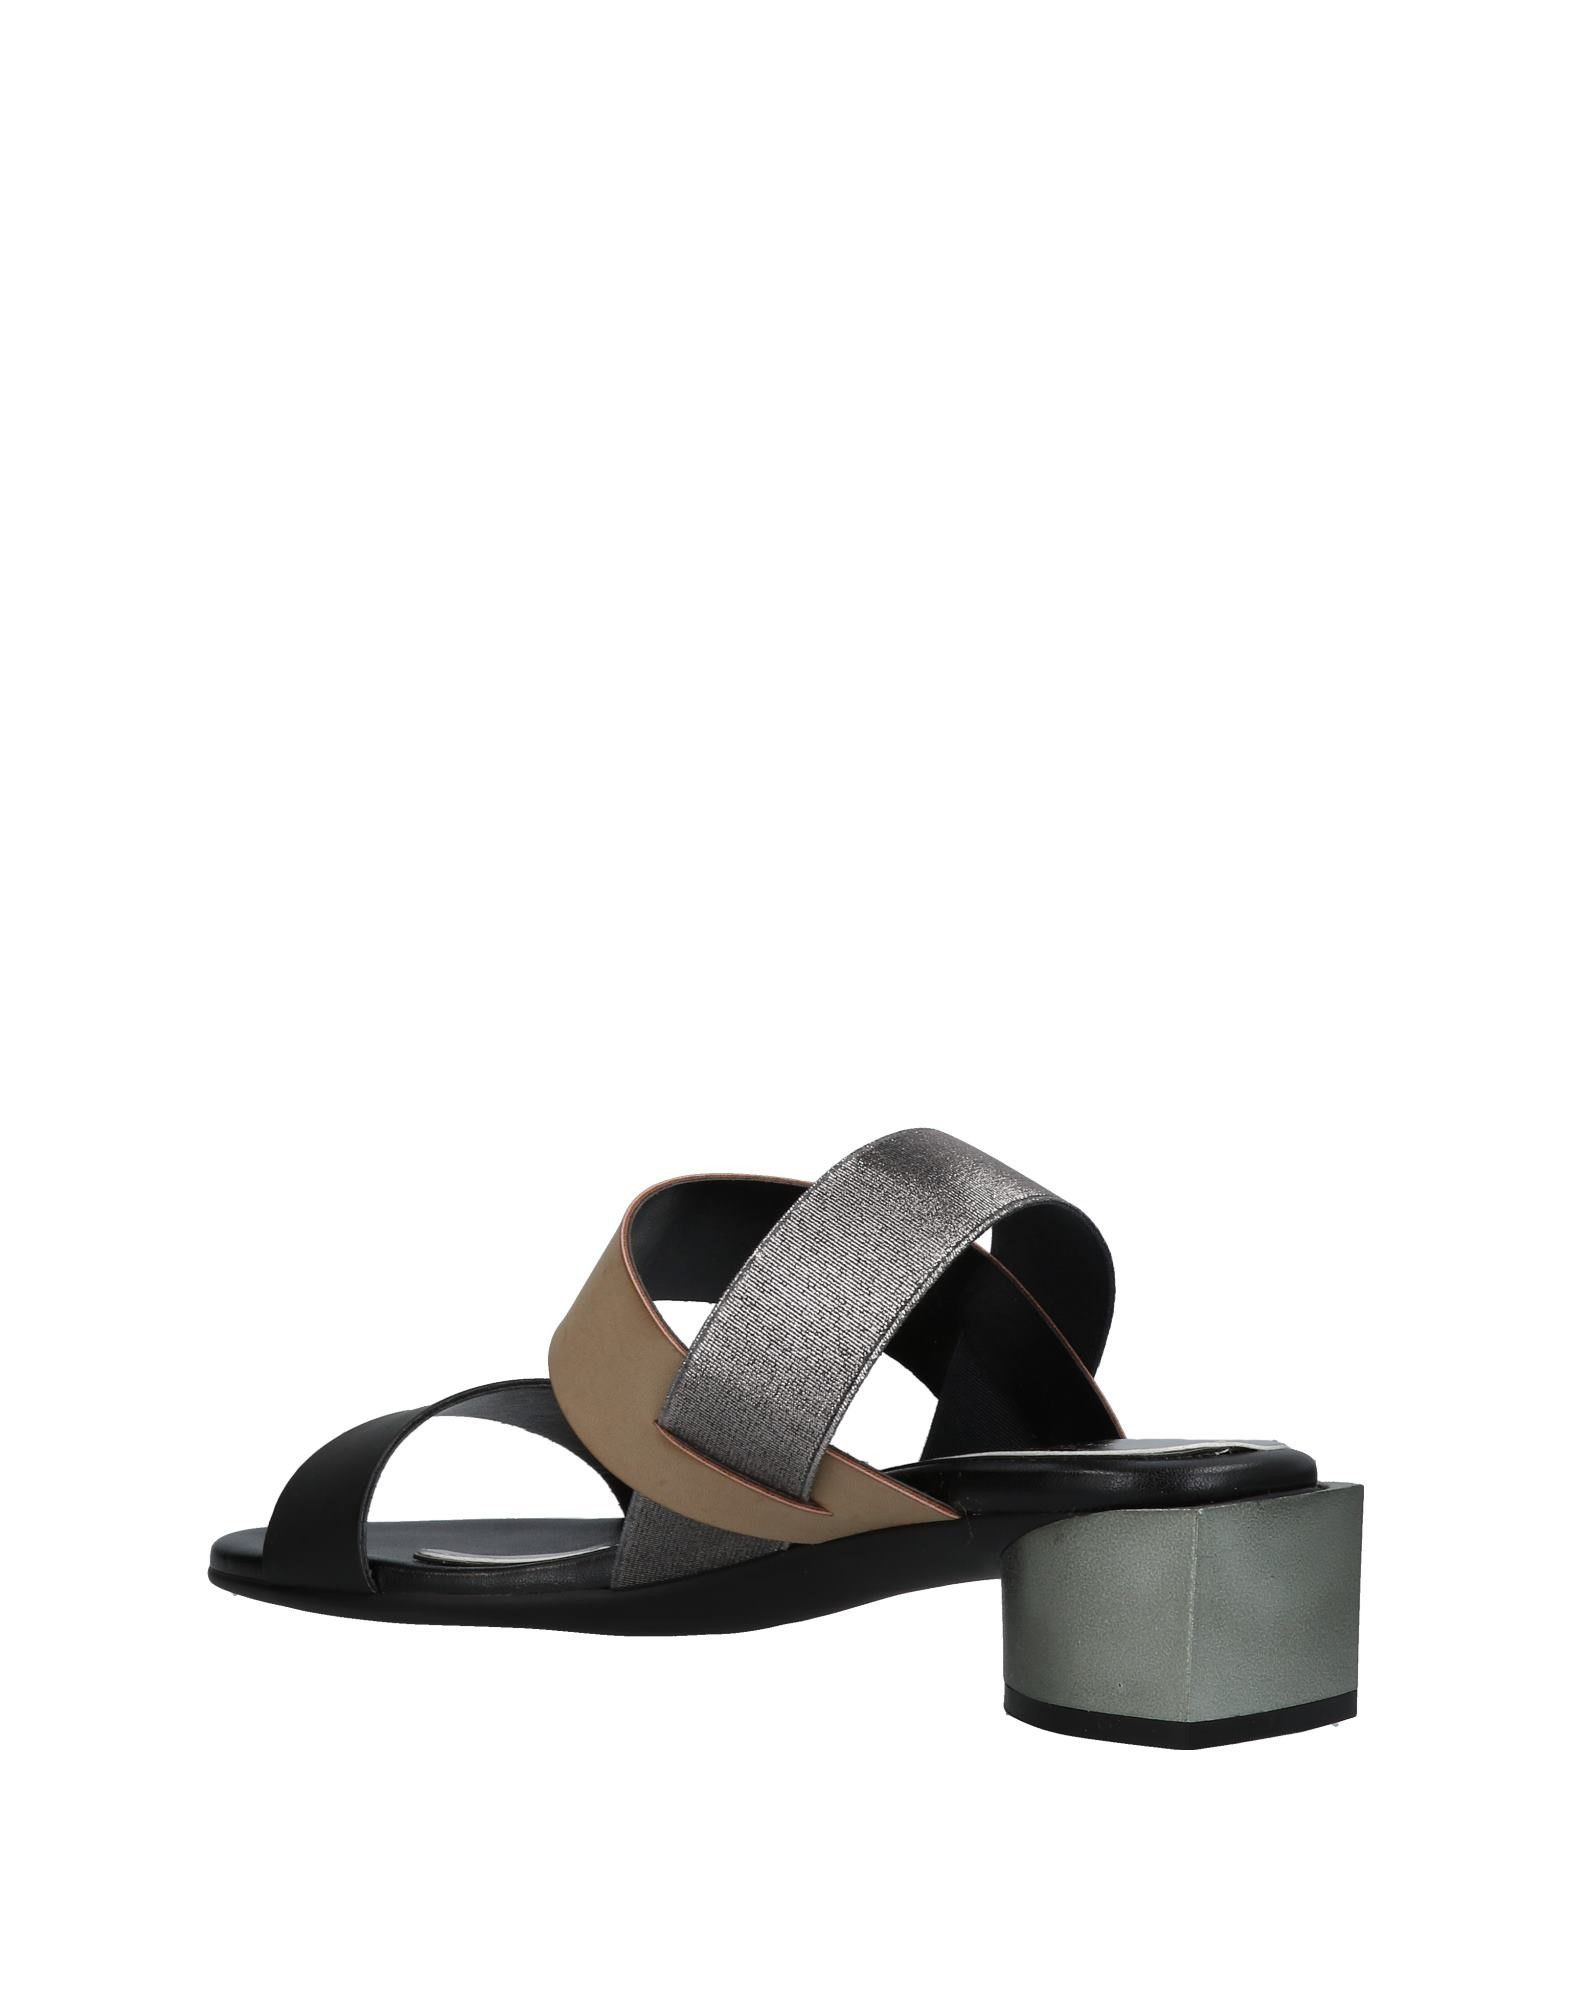 Chaussures - Tribunaux De La Rapisardi 0sJ2cMDr